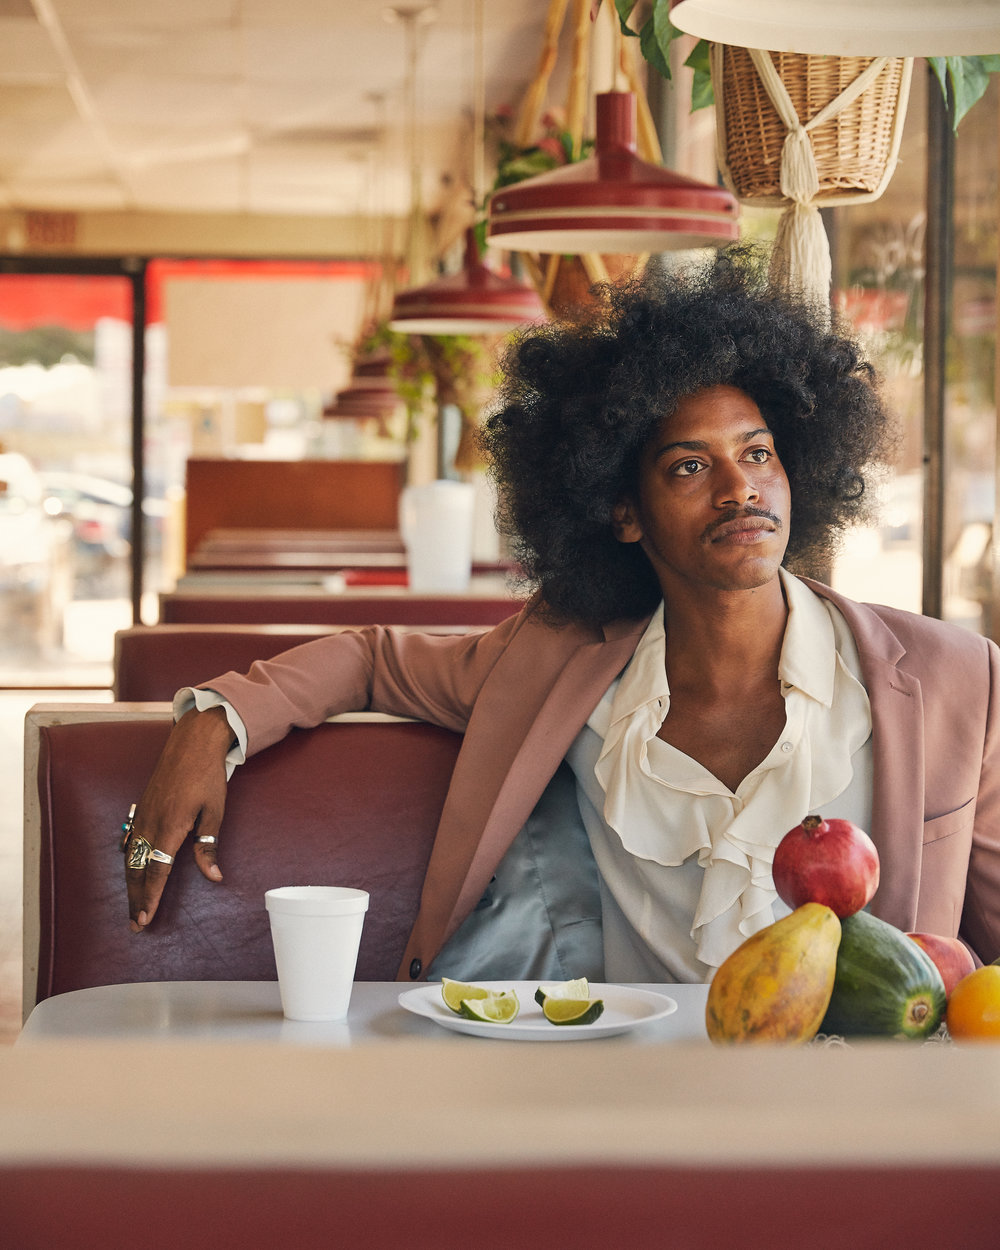 Fruits Vernon - photography Ross Martinstyling Jacob X Jordanmodel Vernon Bobby#StarkMag